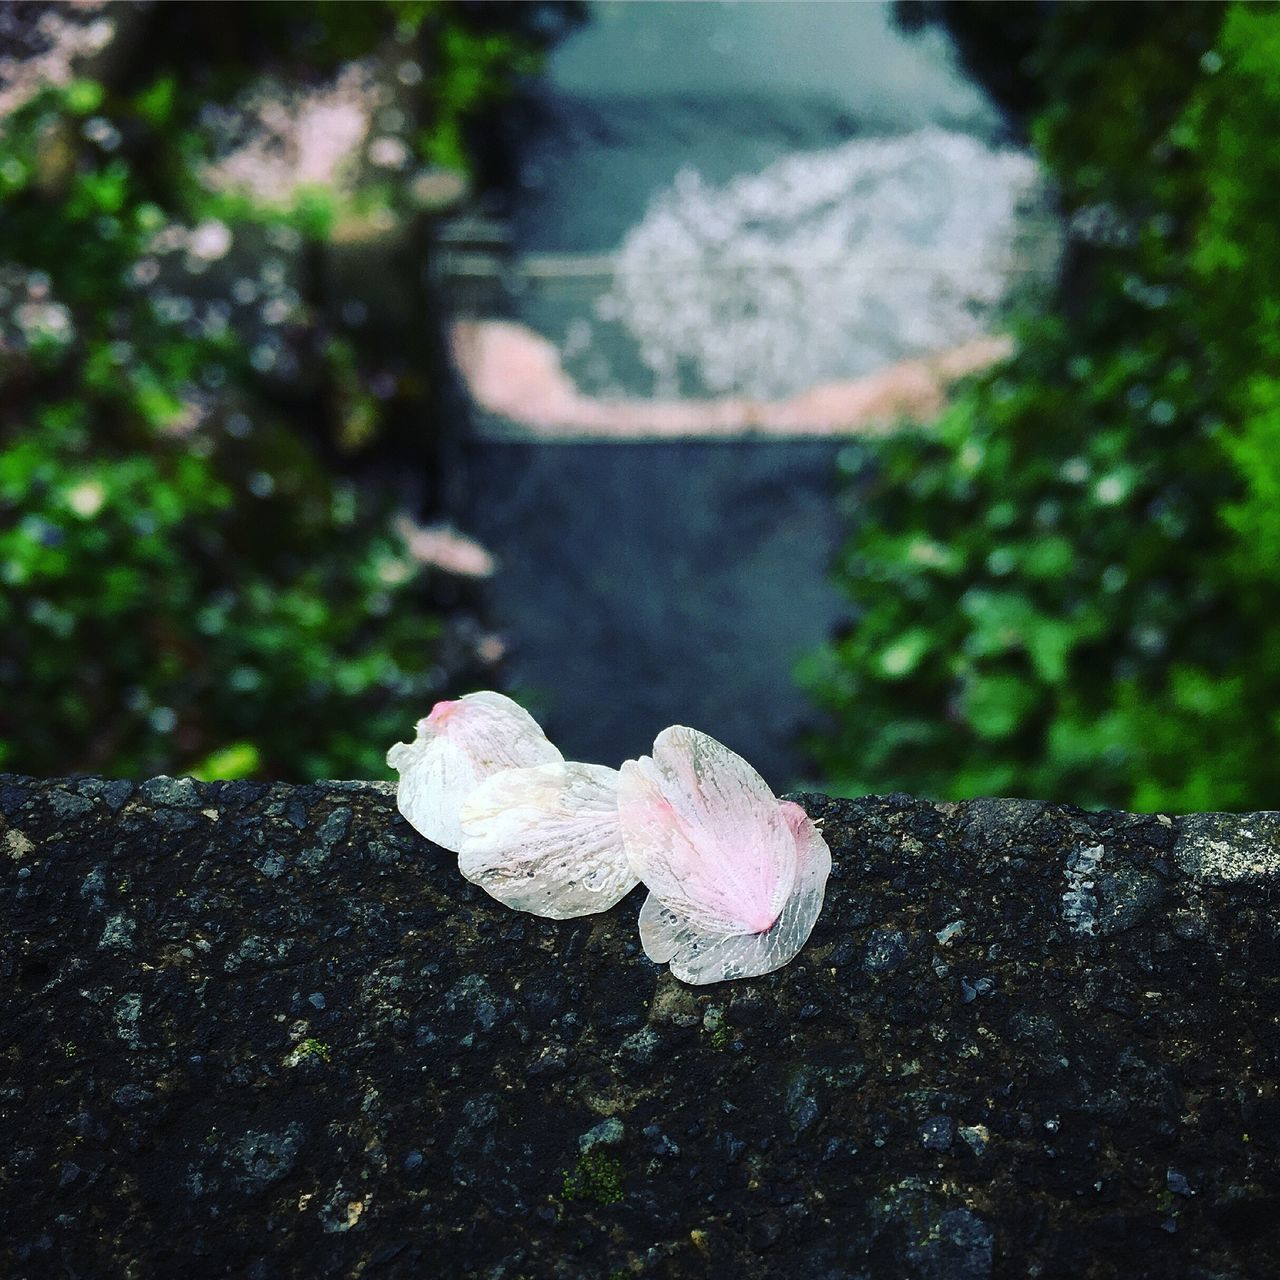 Close-Up Of Petals Against Blurred Plants